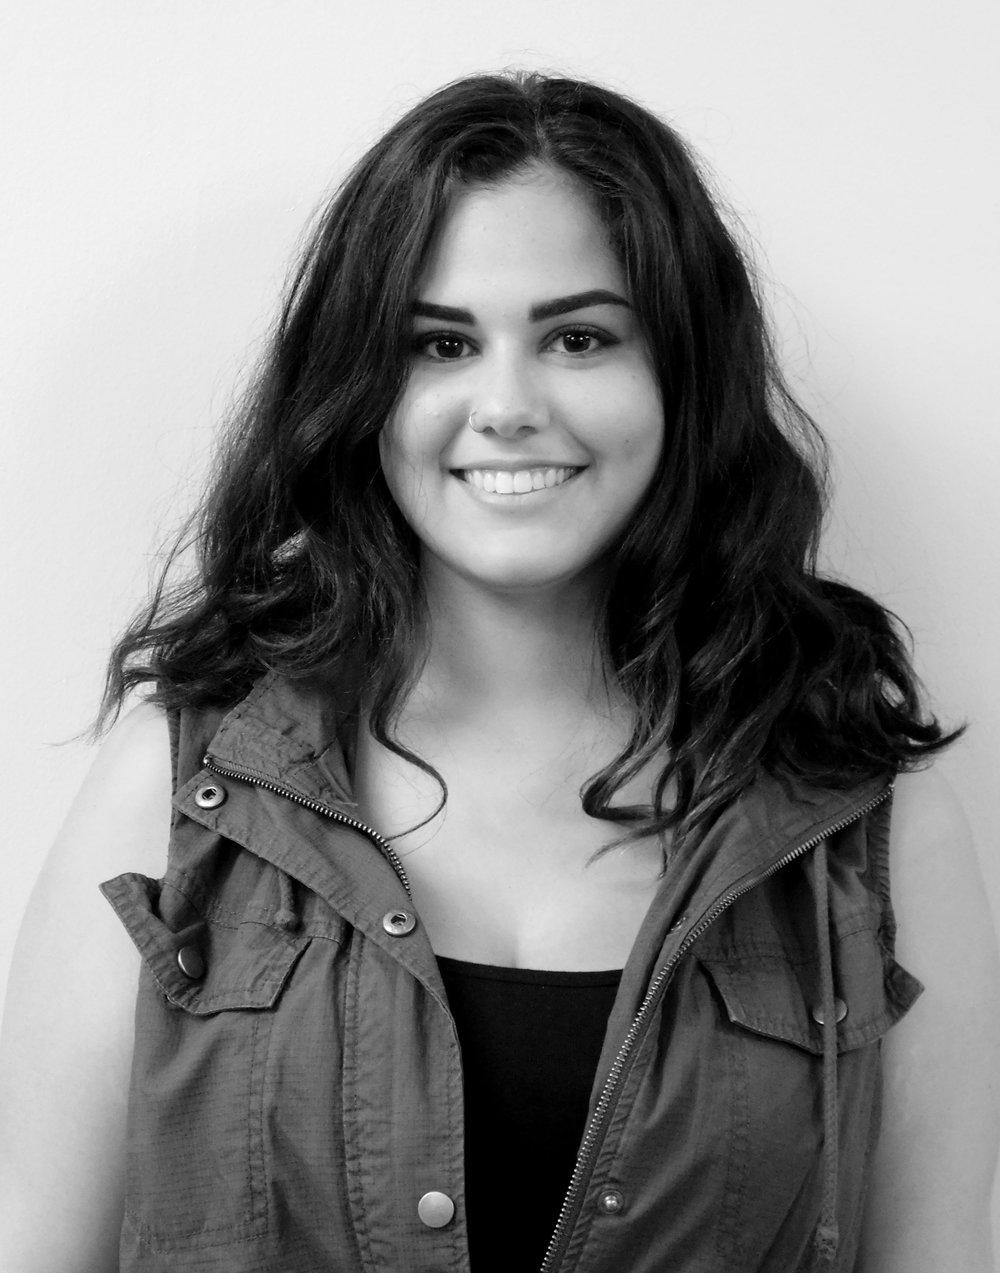 Lucy Vavala (Padua Academy '14)